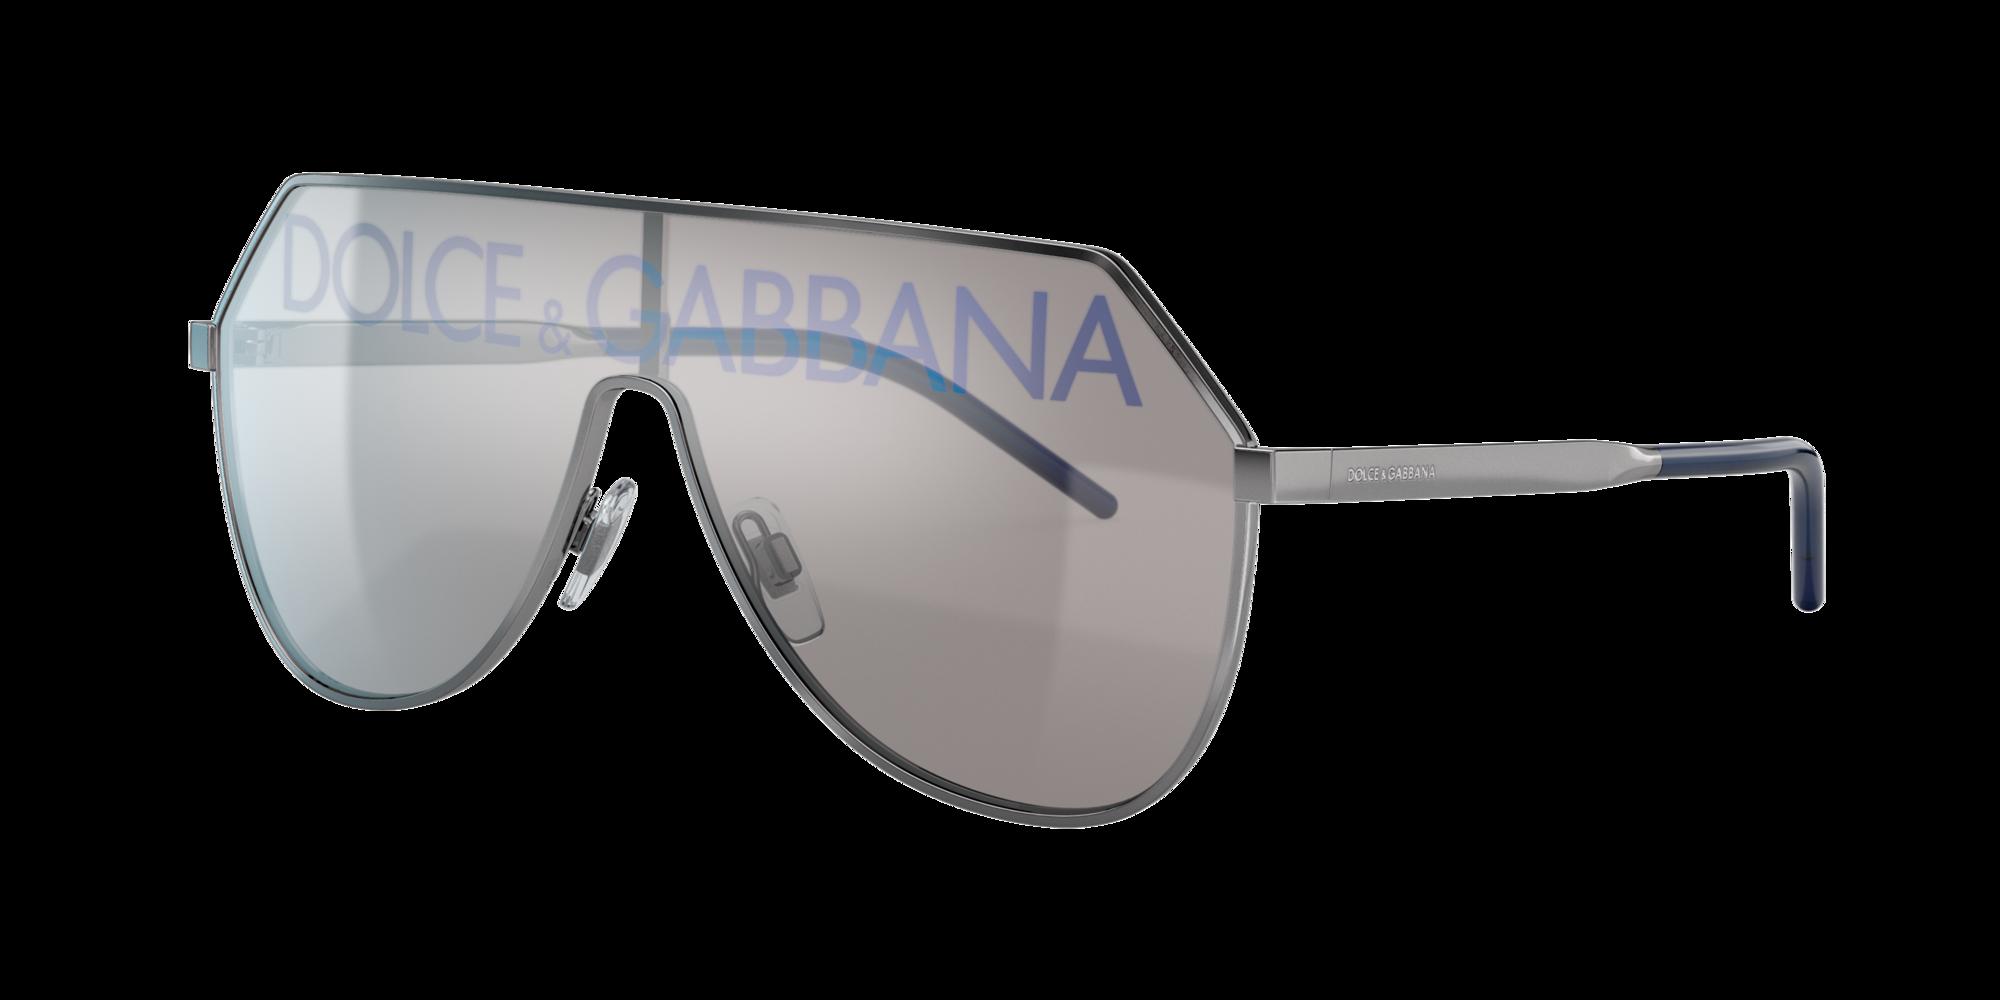 Dolce And Gabbana Man  DG2221 -  Frame color  Gunmetal, Lens color  Silver, Size 01-38 145